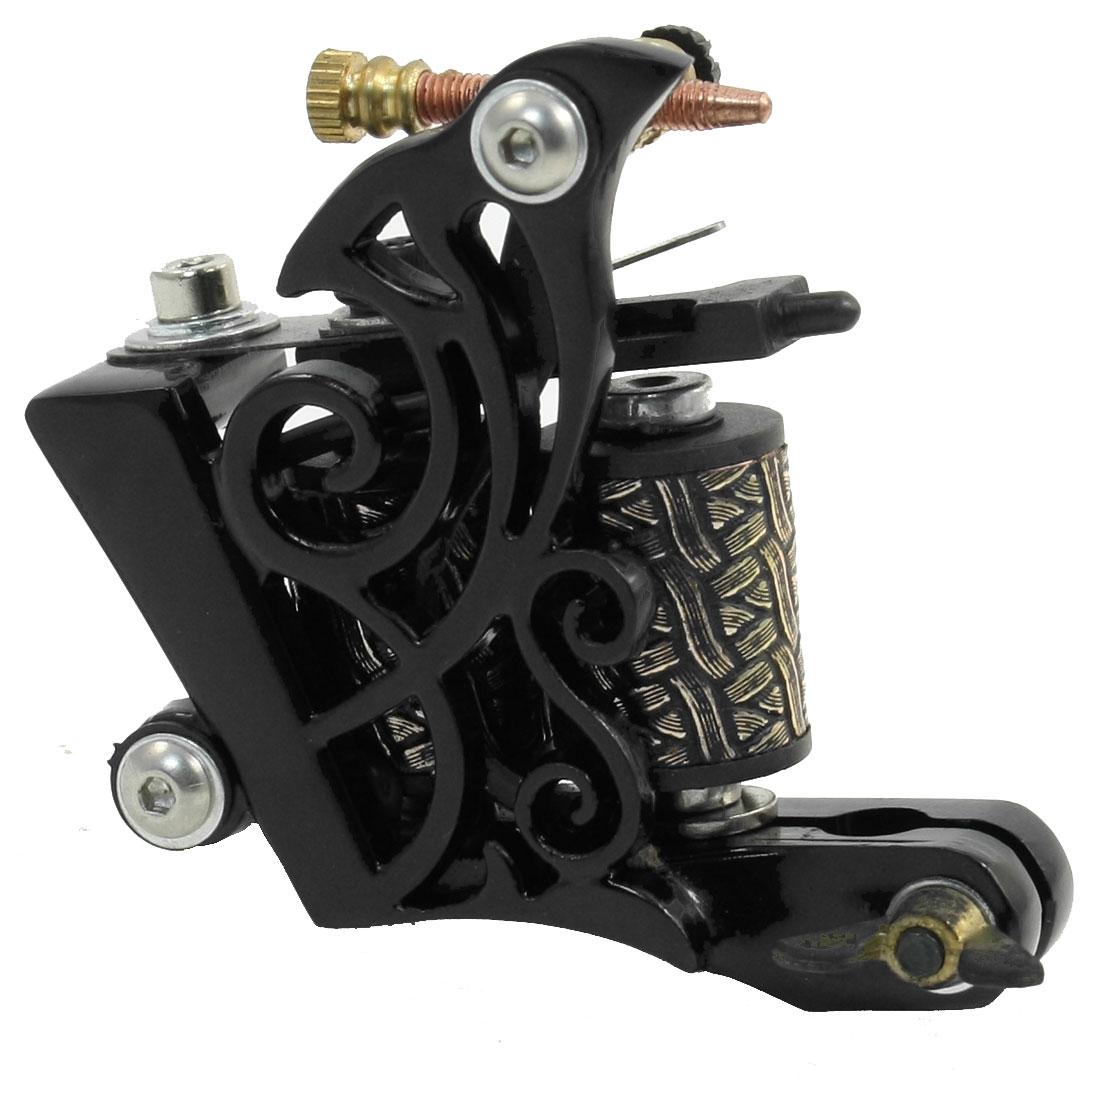 Handmade Black Swirl Decor Liner Shader Tattoo Machine Gun 10 Wraps Coil